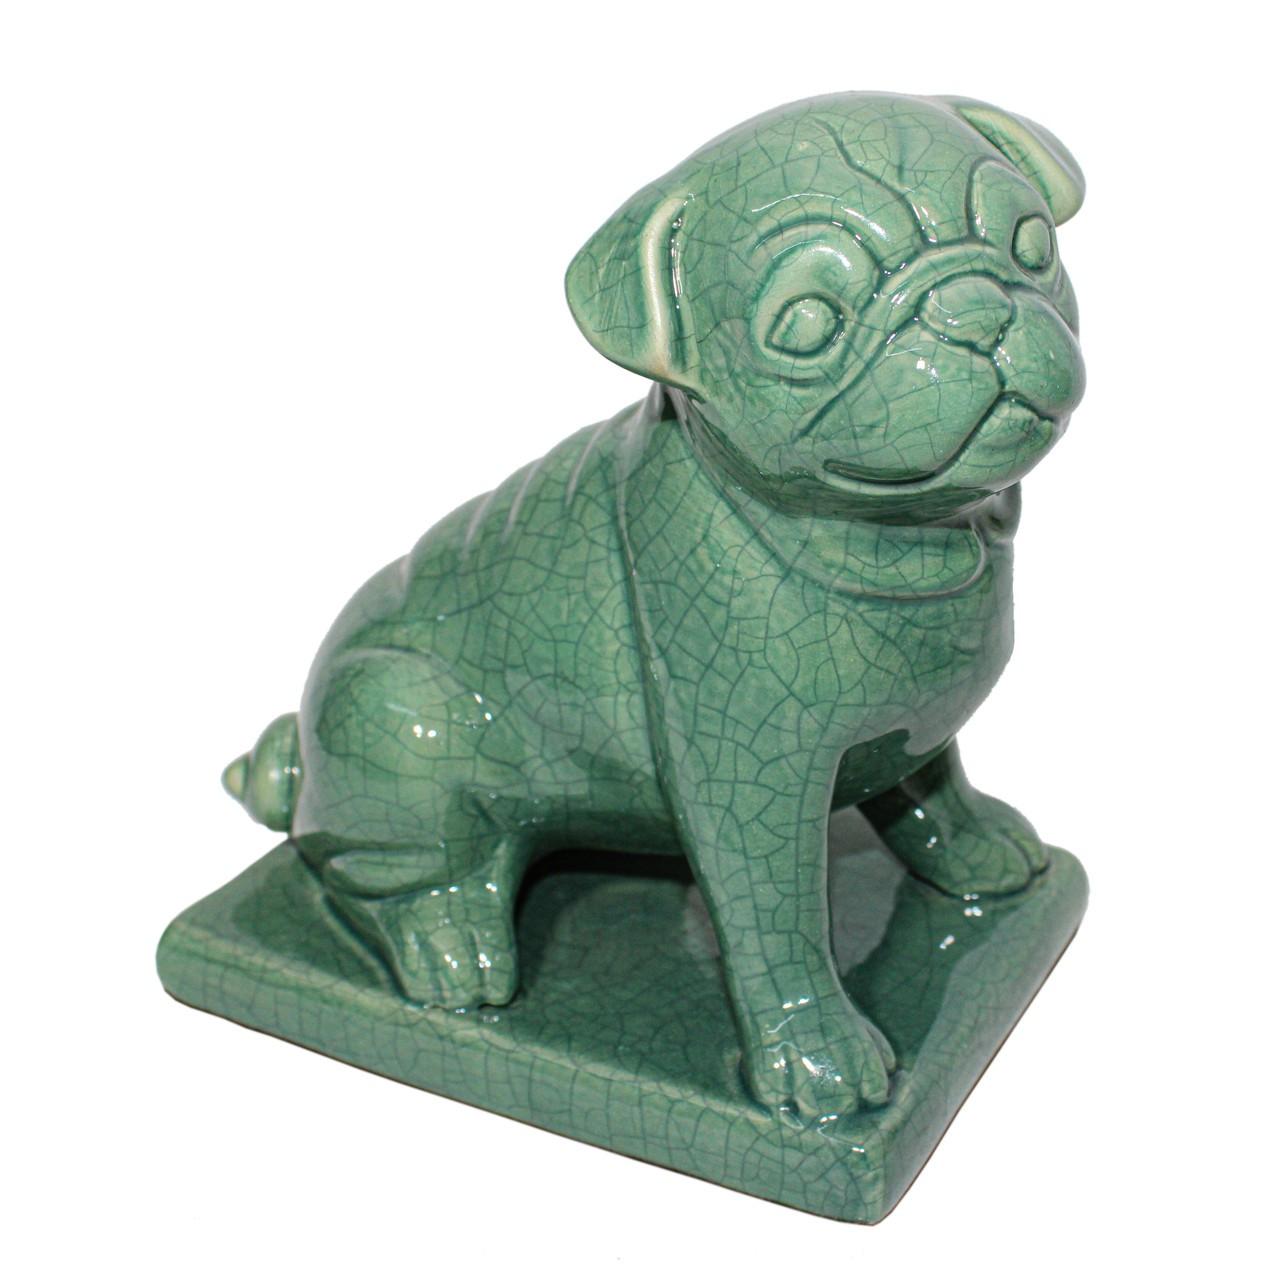 Cachorro Sentado Verde Escuro